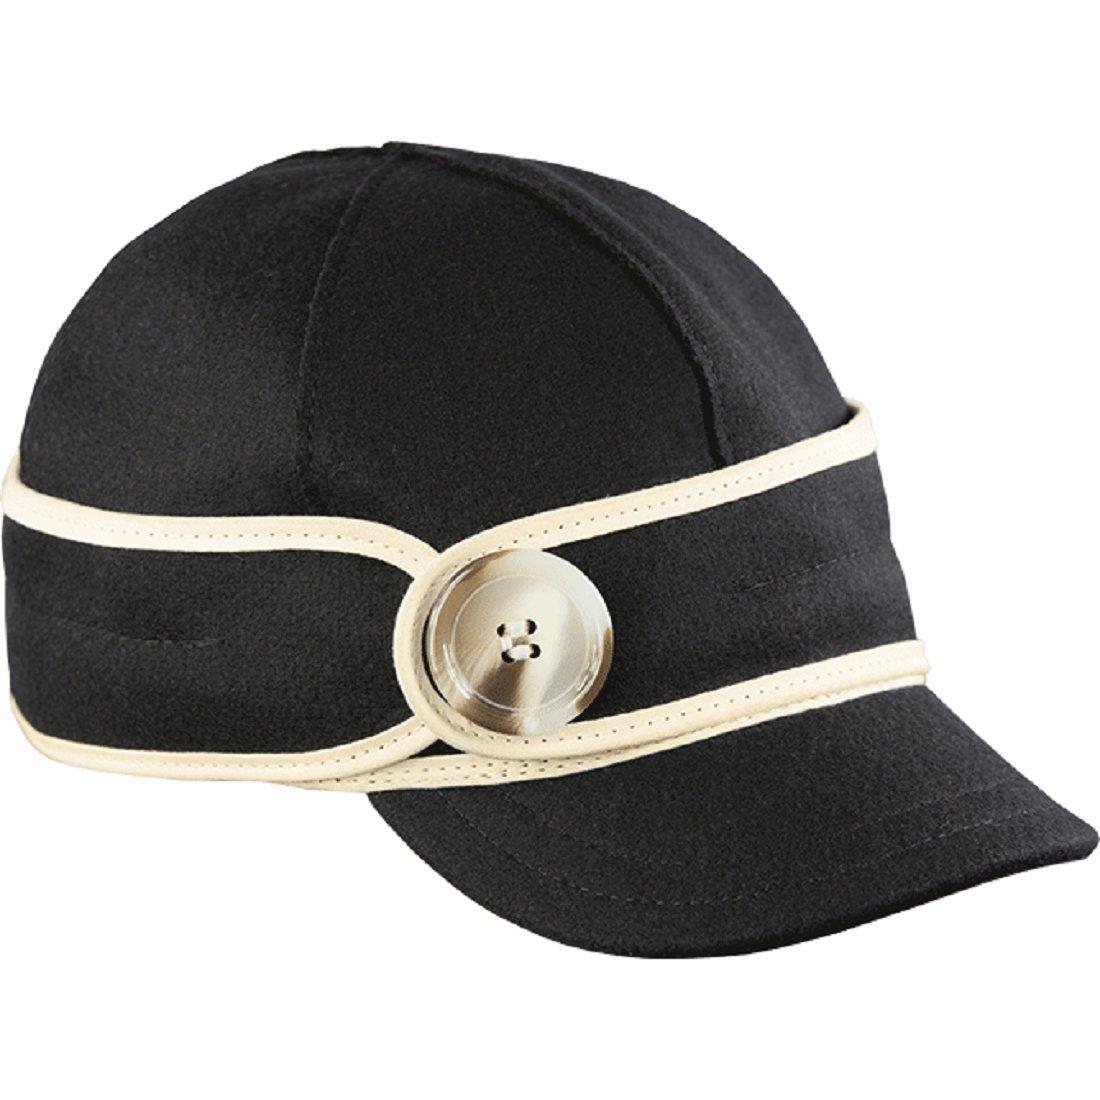 Stormy Kromer Wo Button Up Cap Black/Red Tartan 7 1/2 by Stormy Kromer